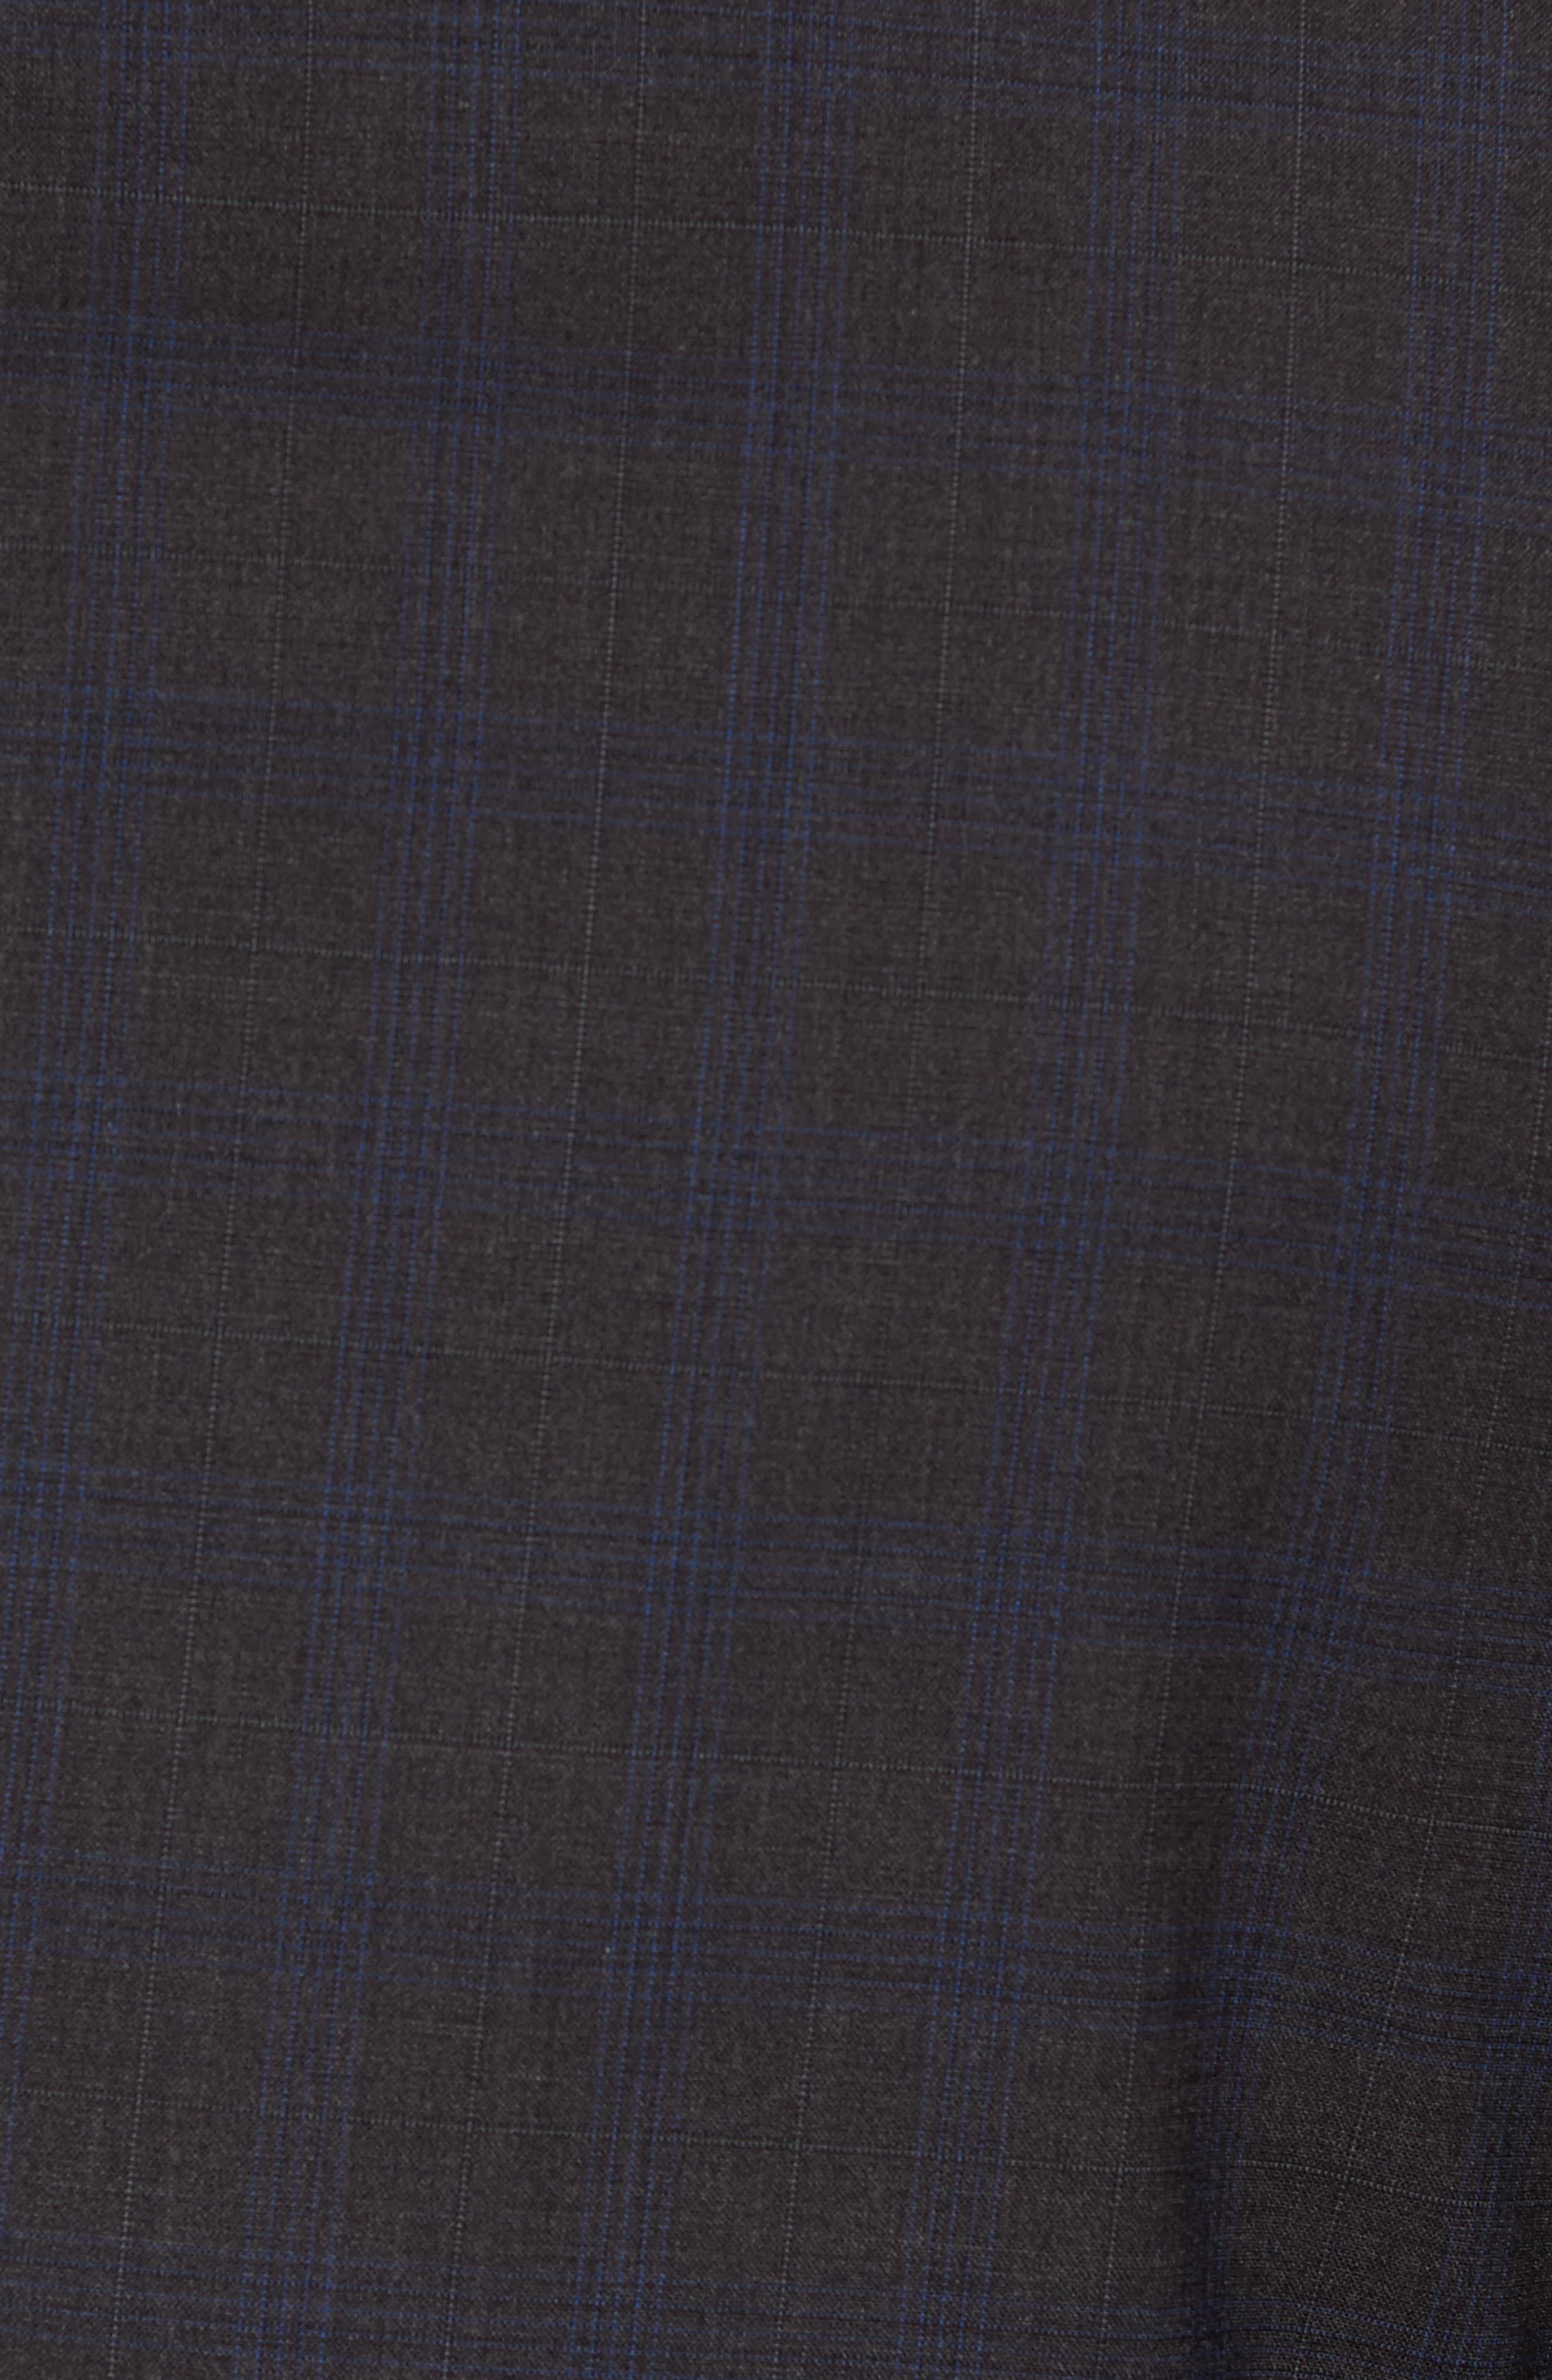 Wellar Grey Blue Plaid Sport Coat,                             Alternate thumbnail 5, color,                             Grey